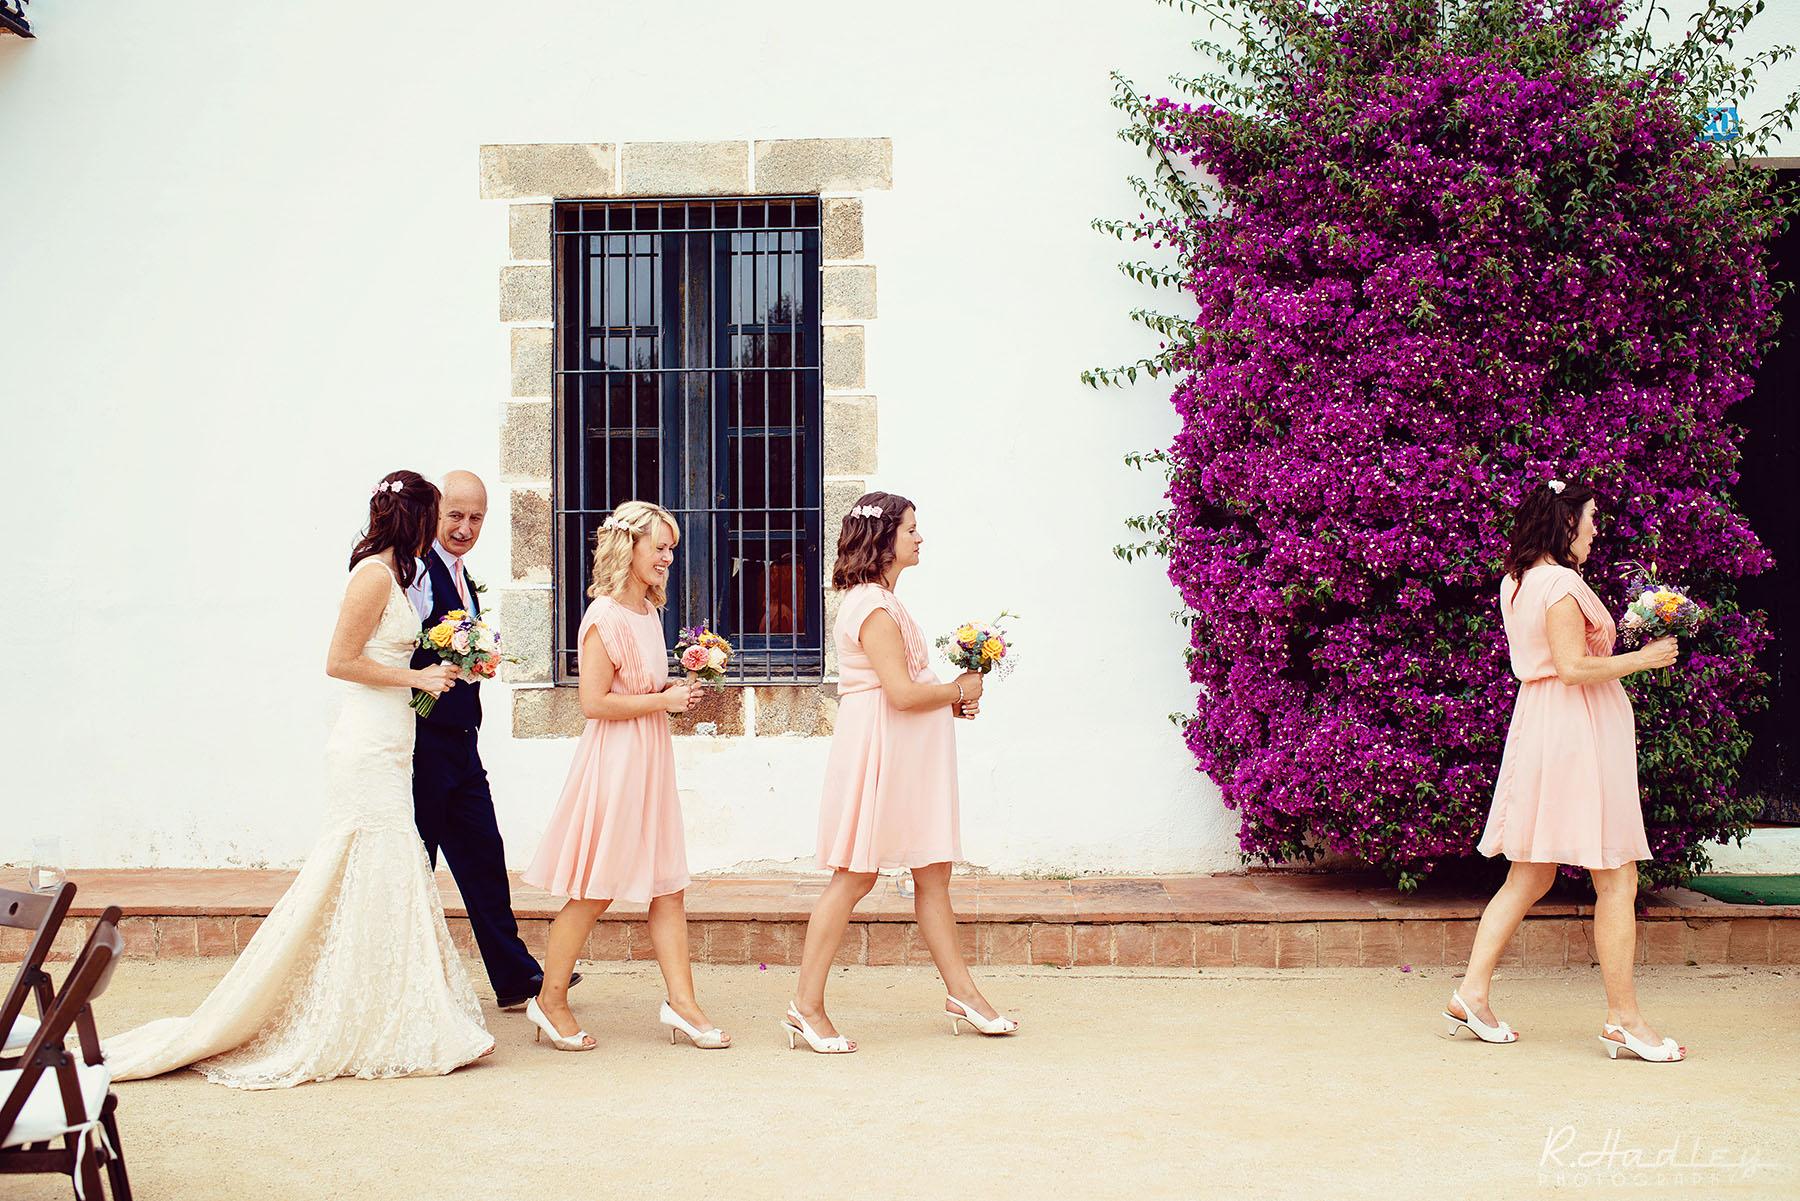 Wedding photographer at Sant Pere de Clara, Barcelona